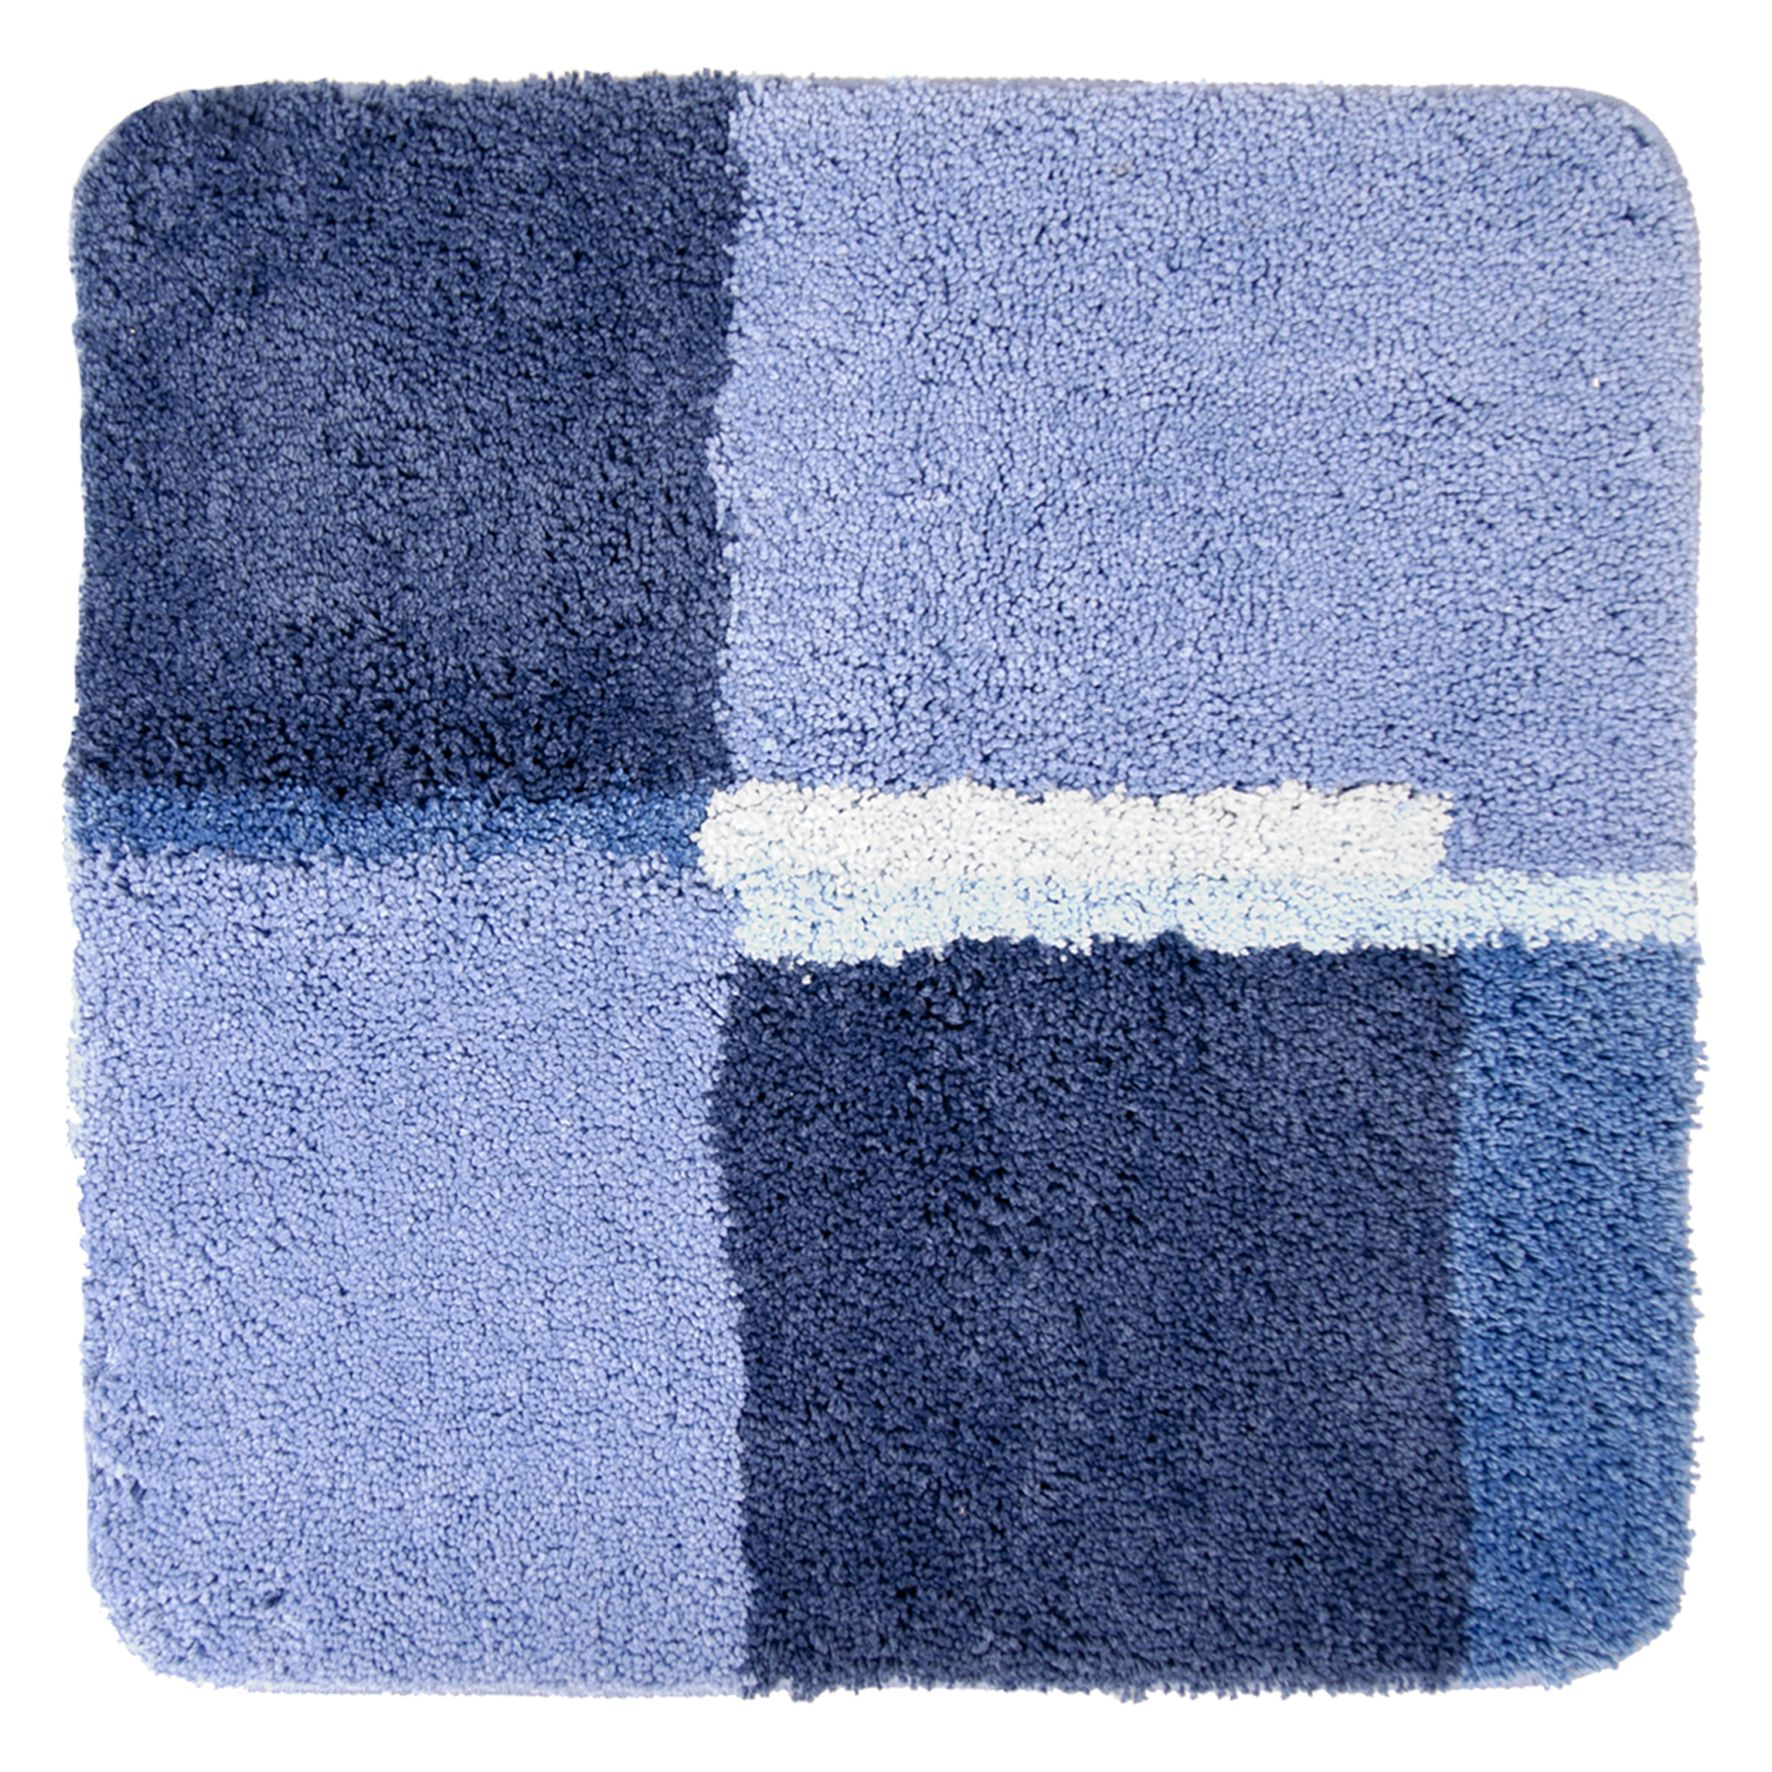 Differnz Cubes badmat 60x60 blauw